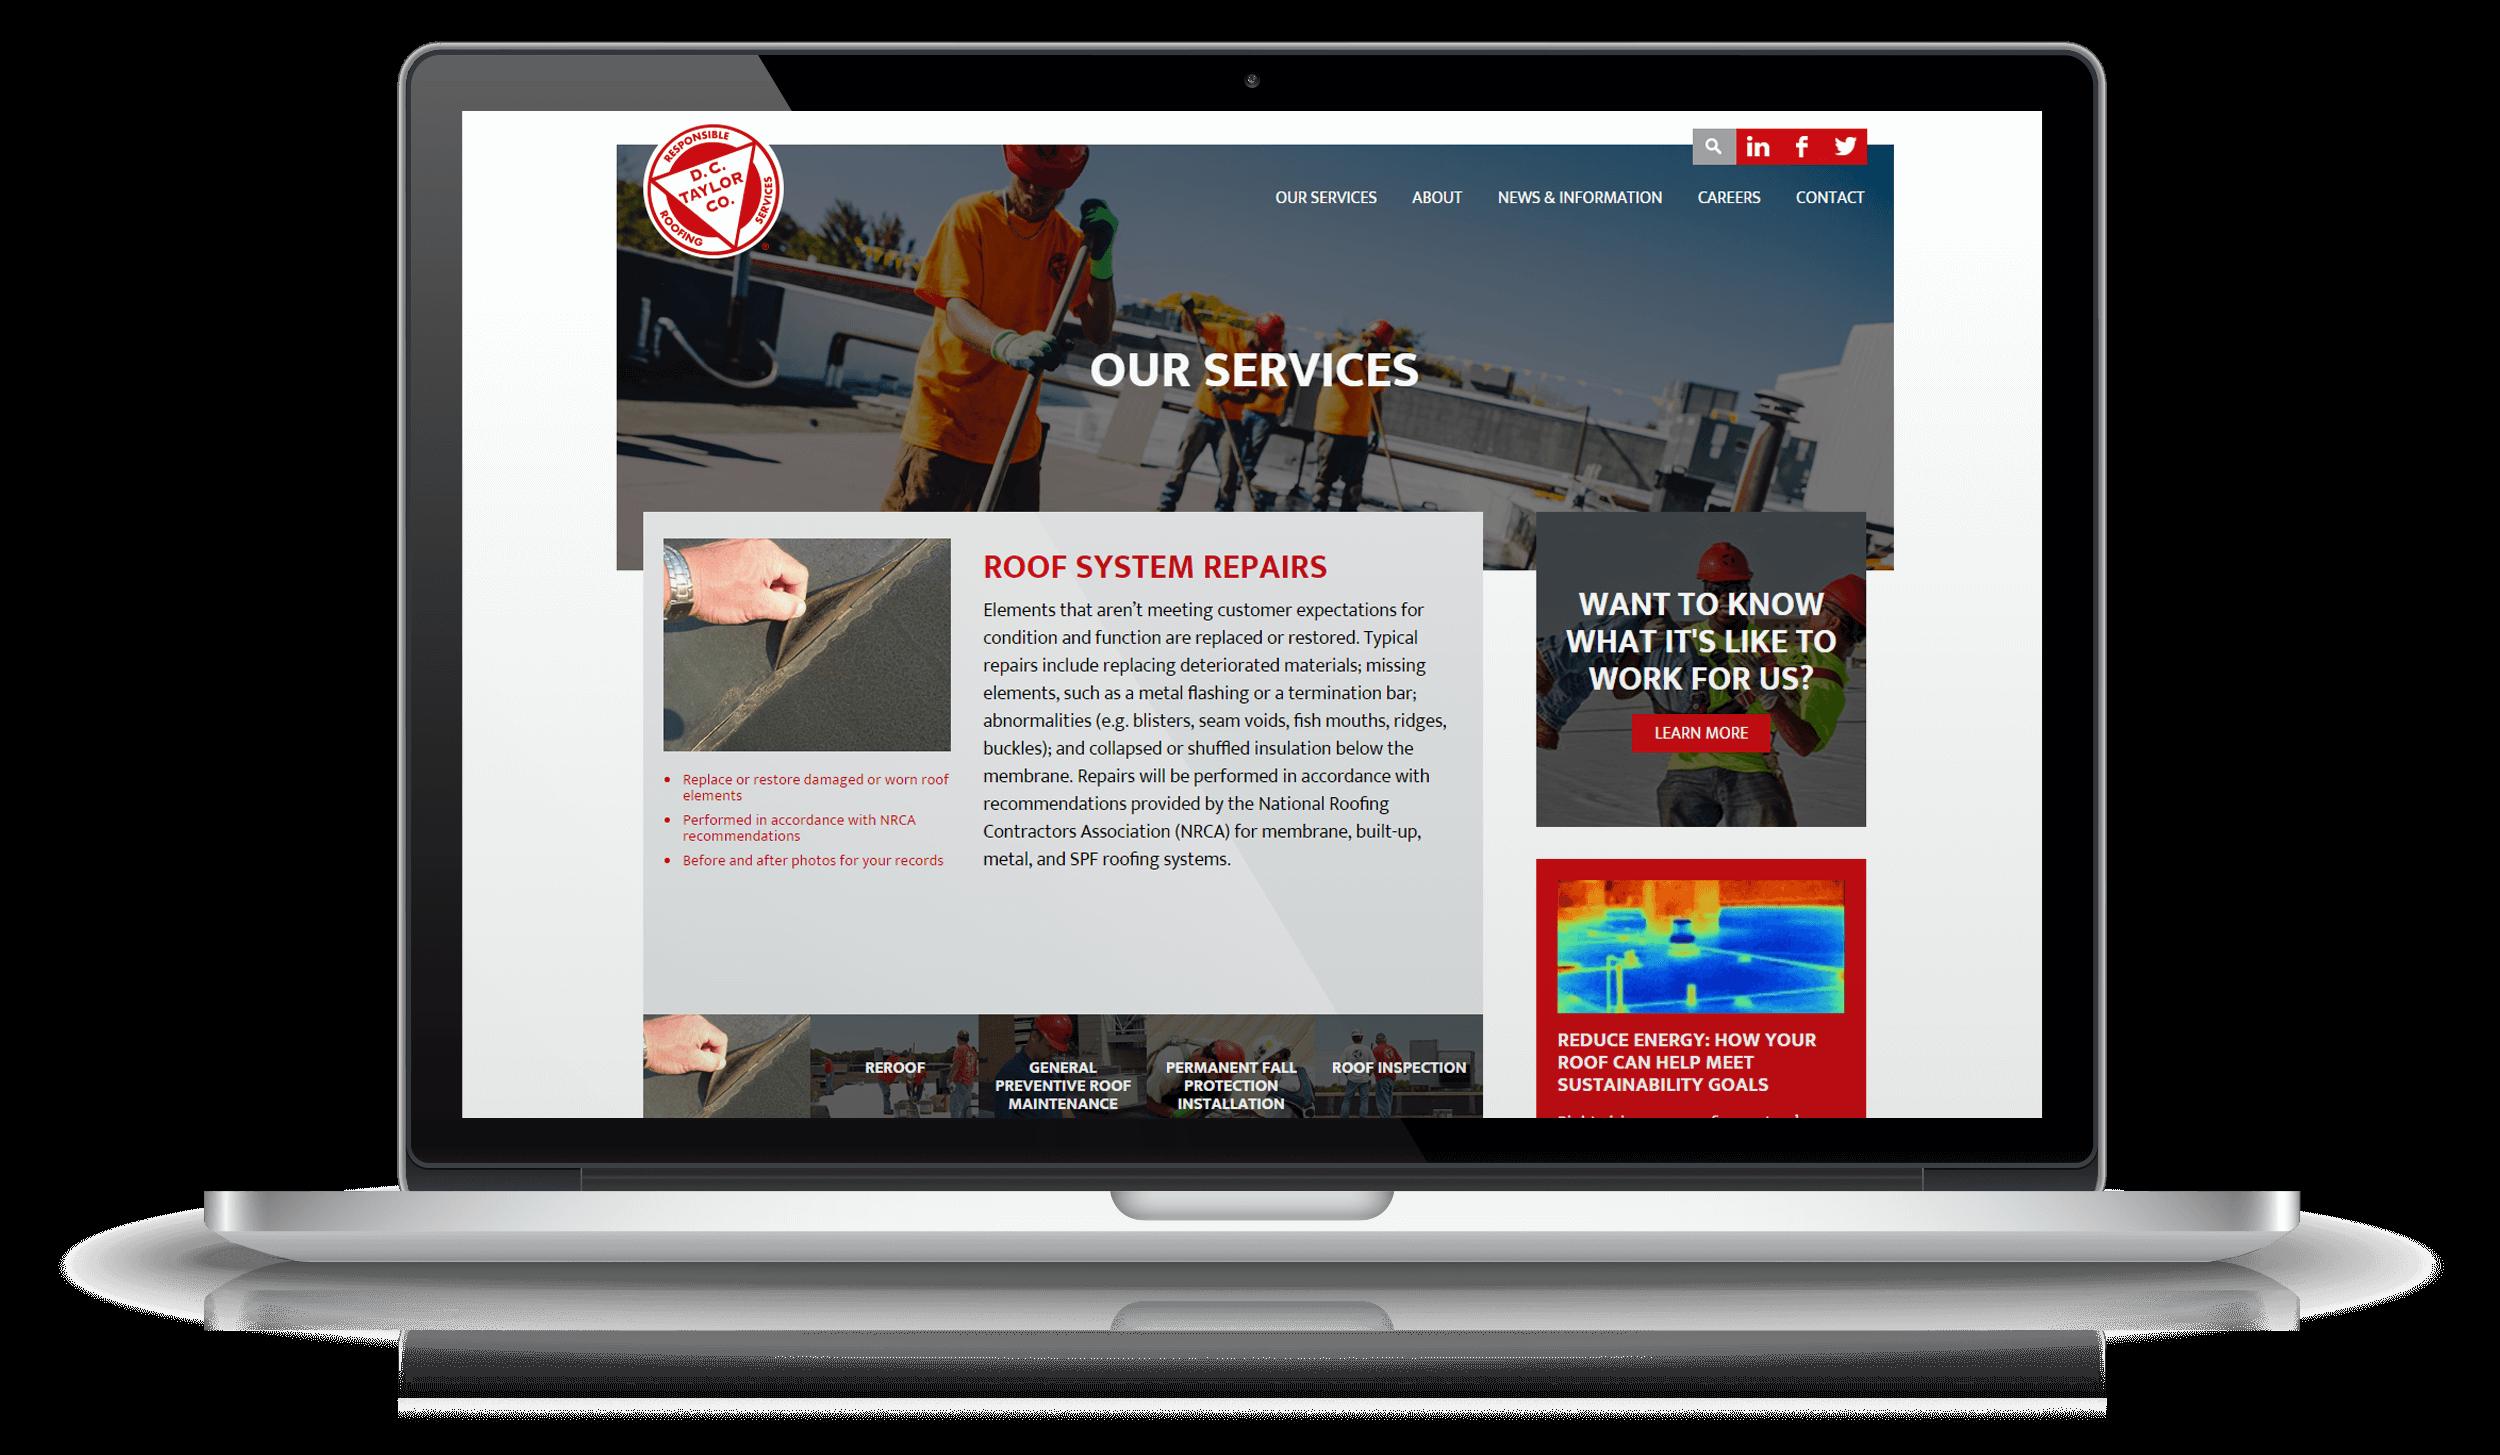 Pixelnation Project: D.C. Taylor Website - Services Page